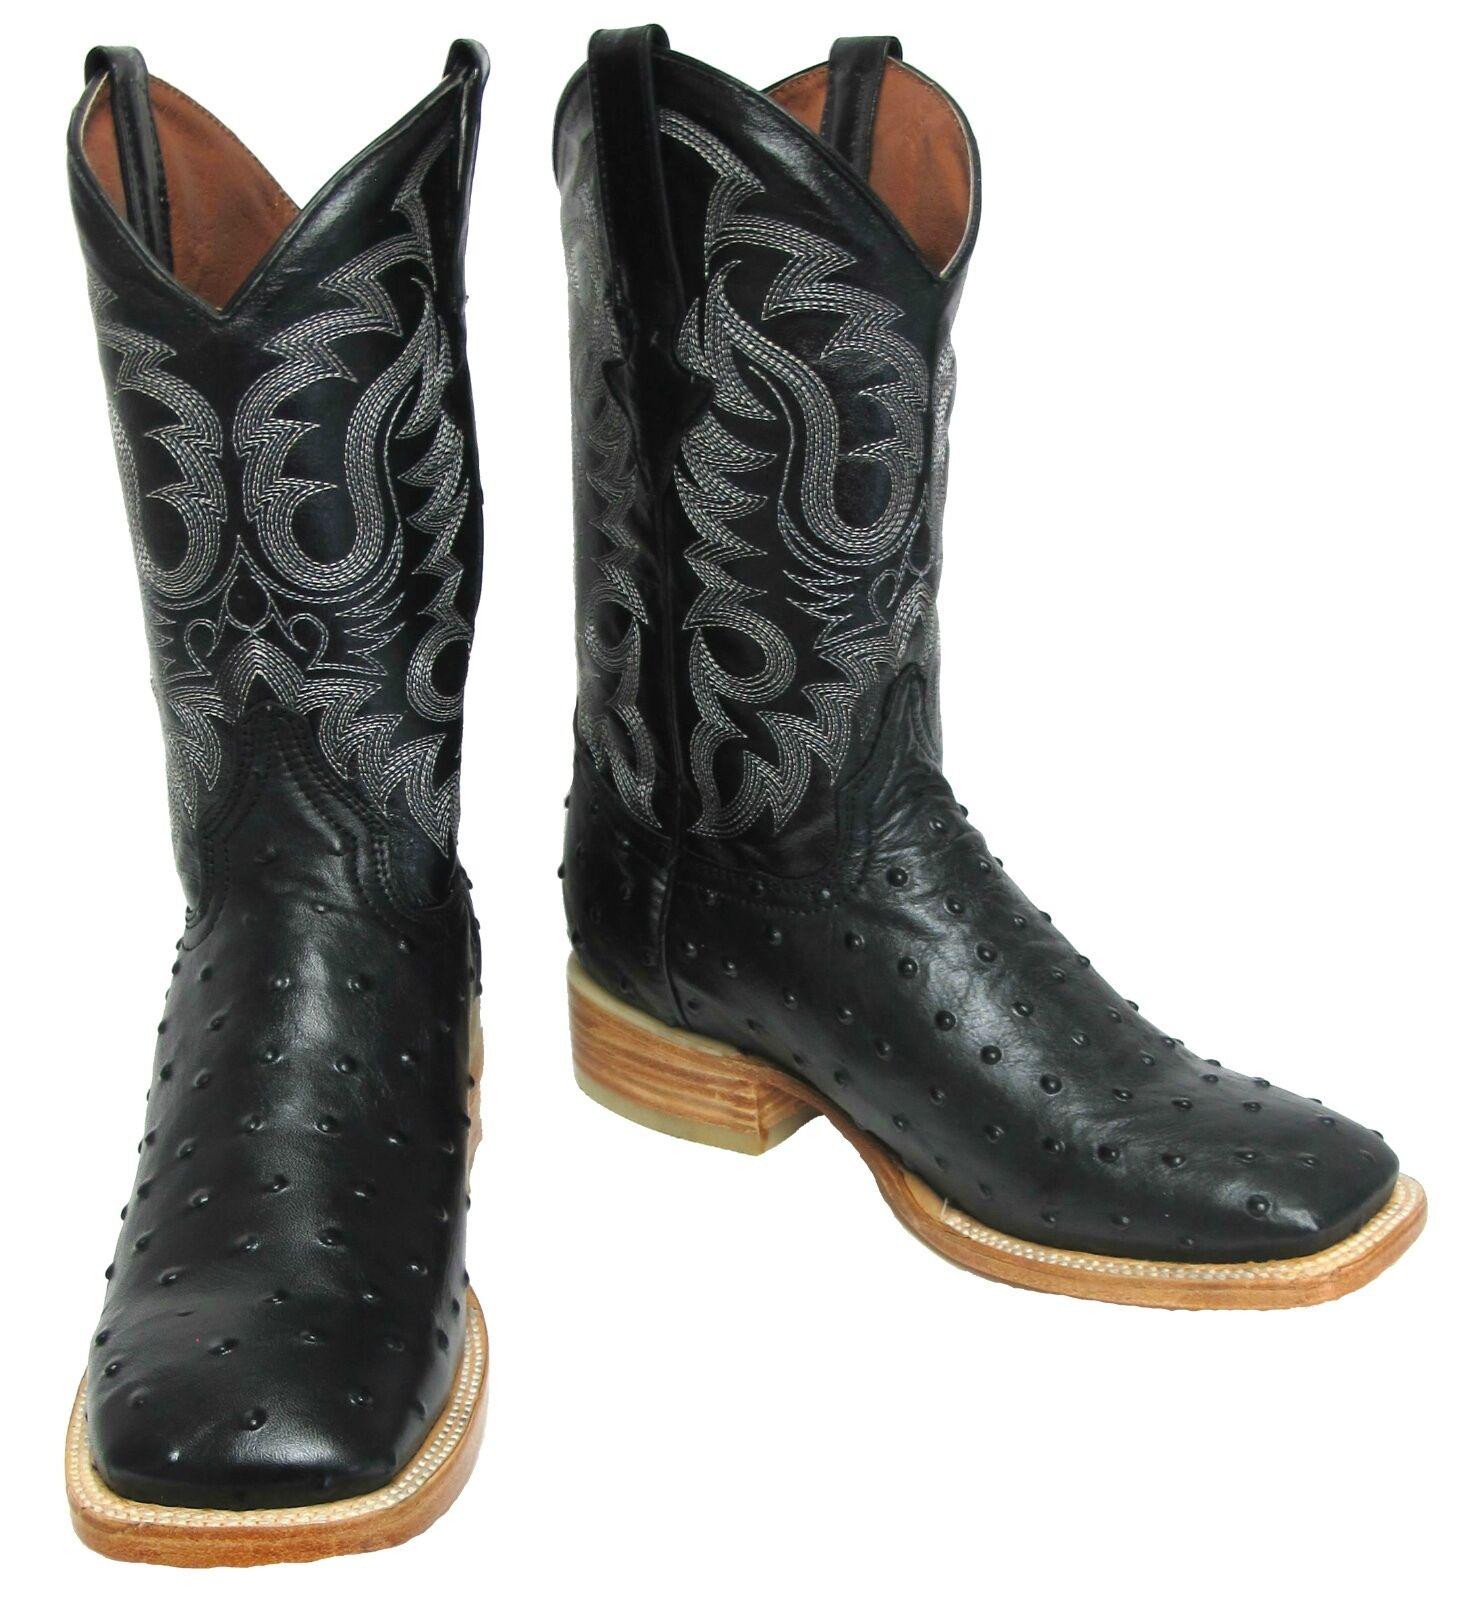 Men's New TW Ostrich Design Leather Cowboy Western Square Boots Black